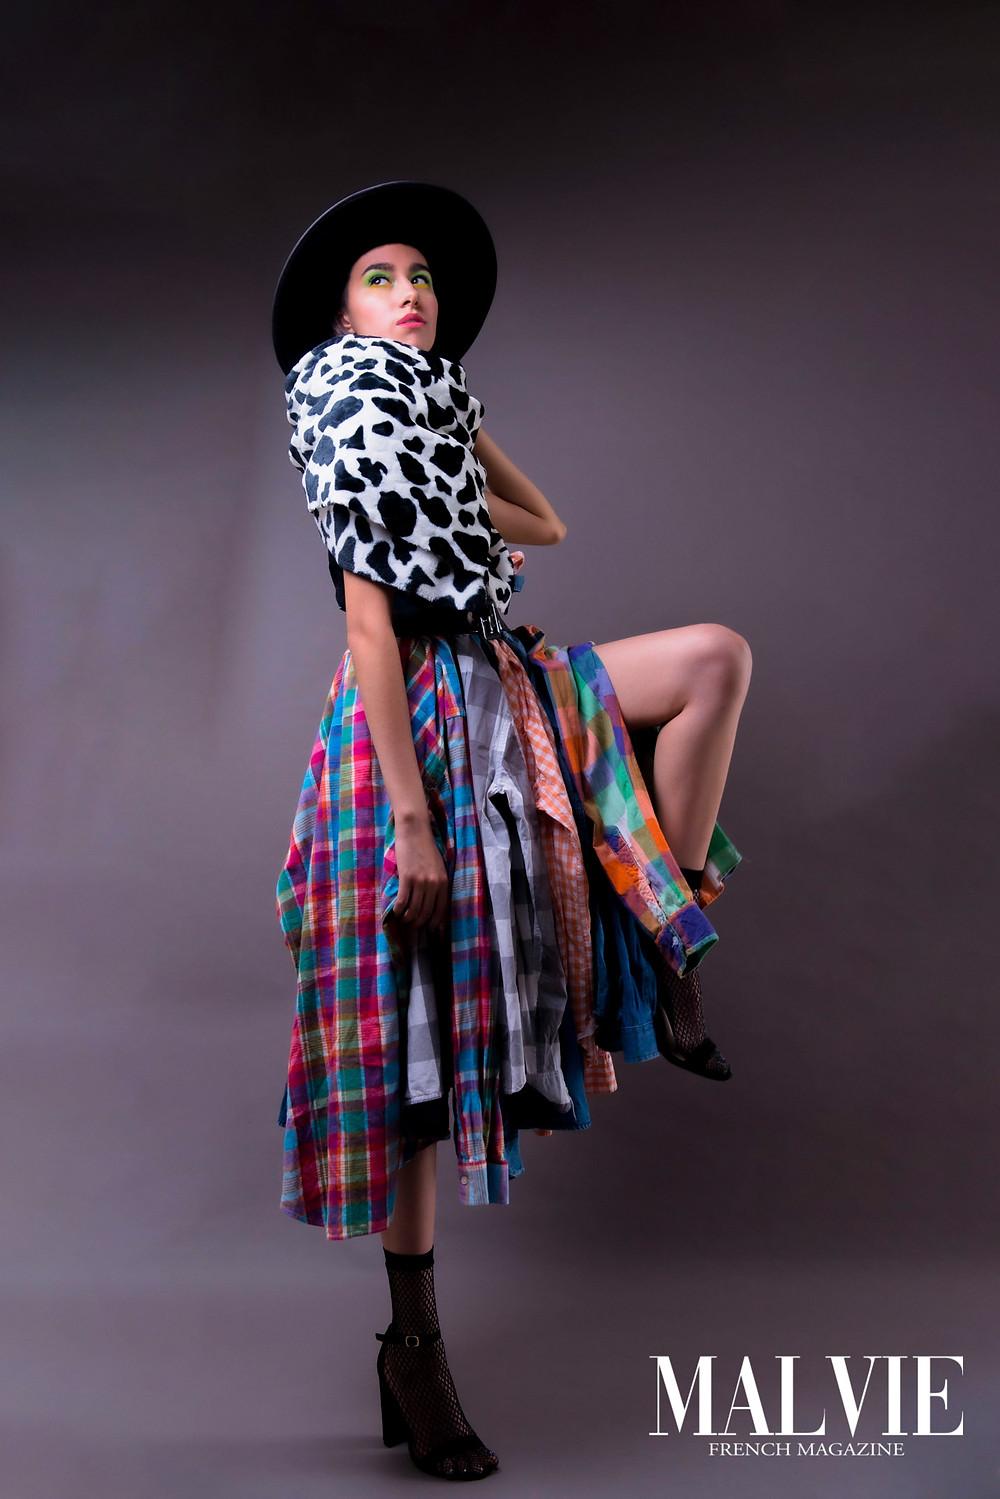 Model: Paulina Treto @pauvelez1 Photographer: Rock Dueñas @iamrockduenas Styling: ElPinche Stylist @ElPinche.Stylist